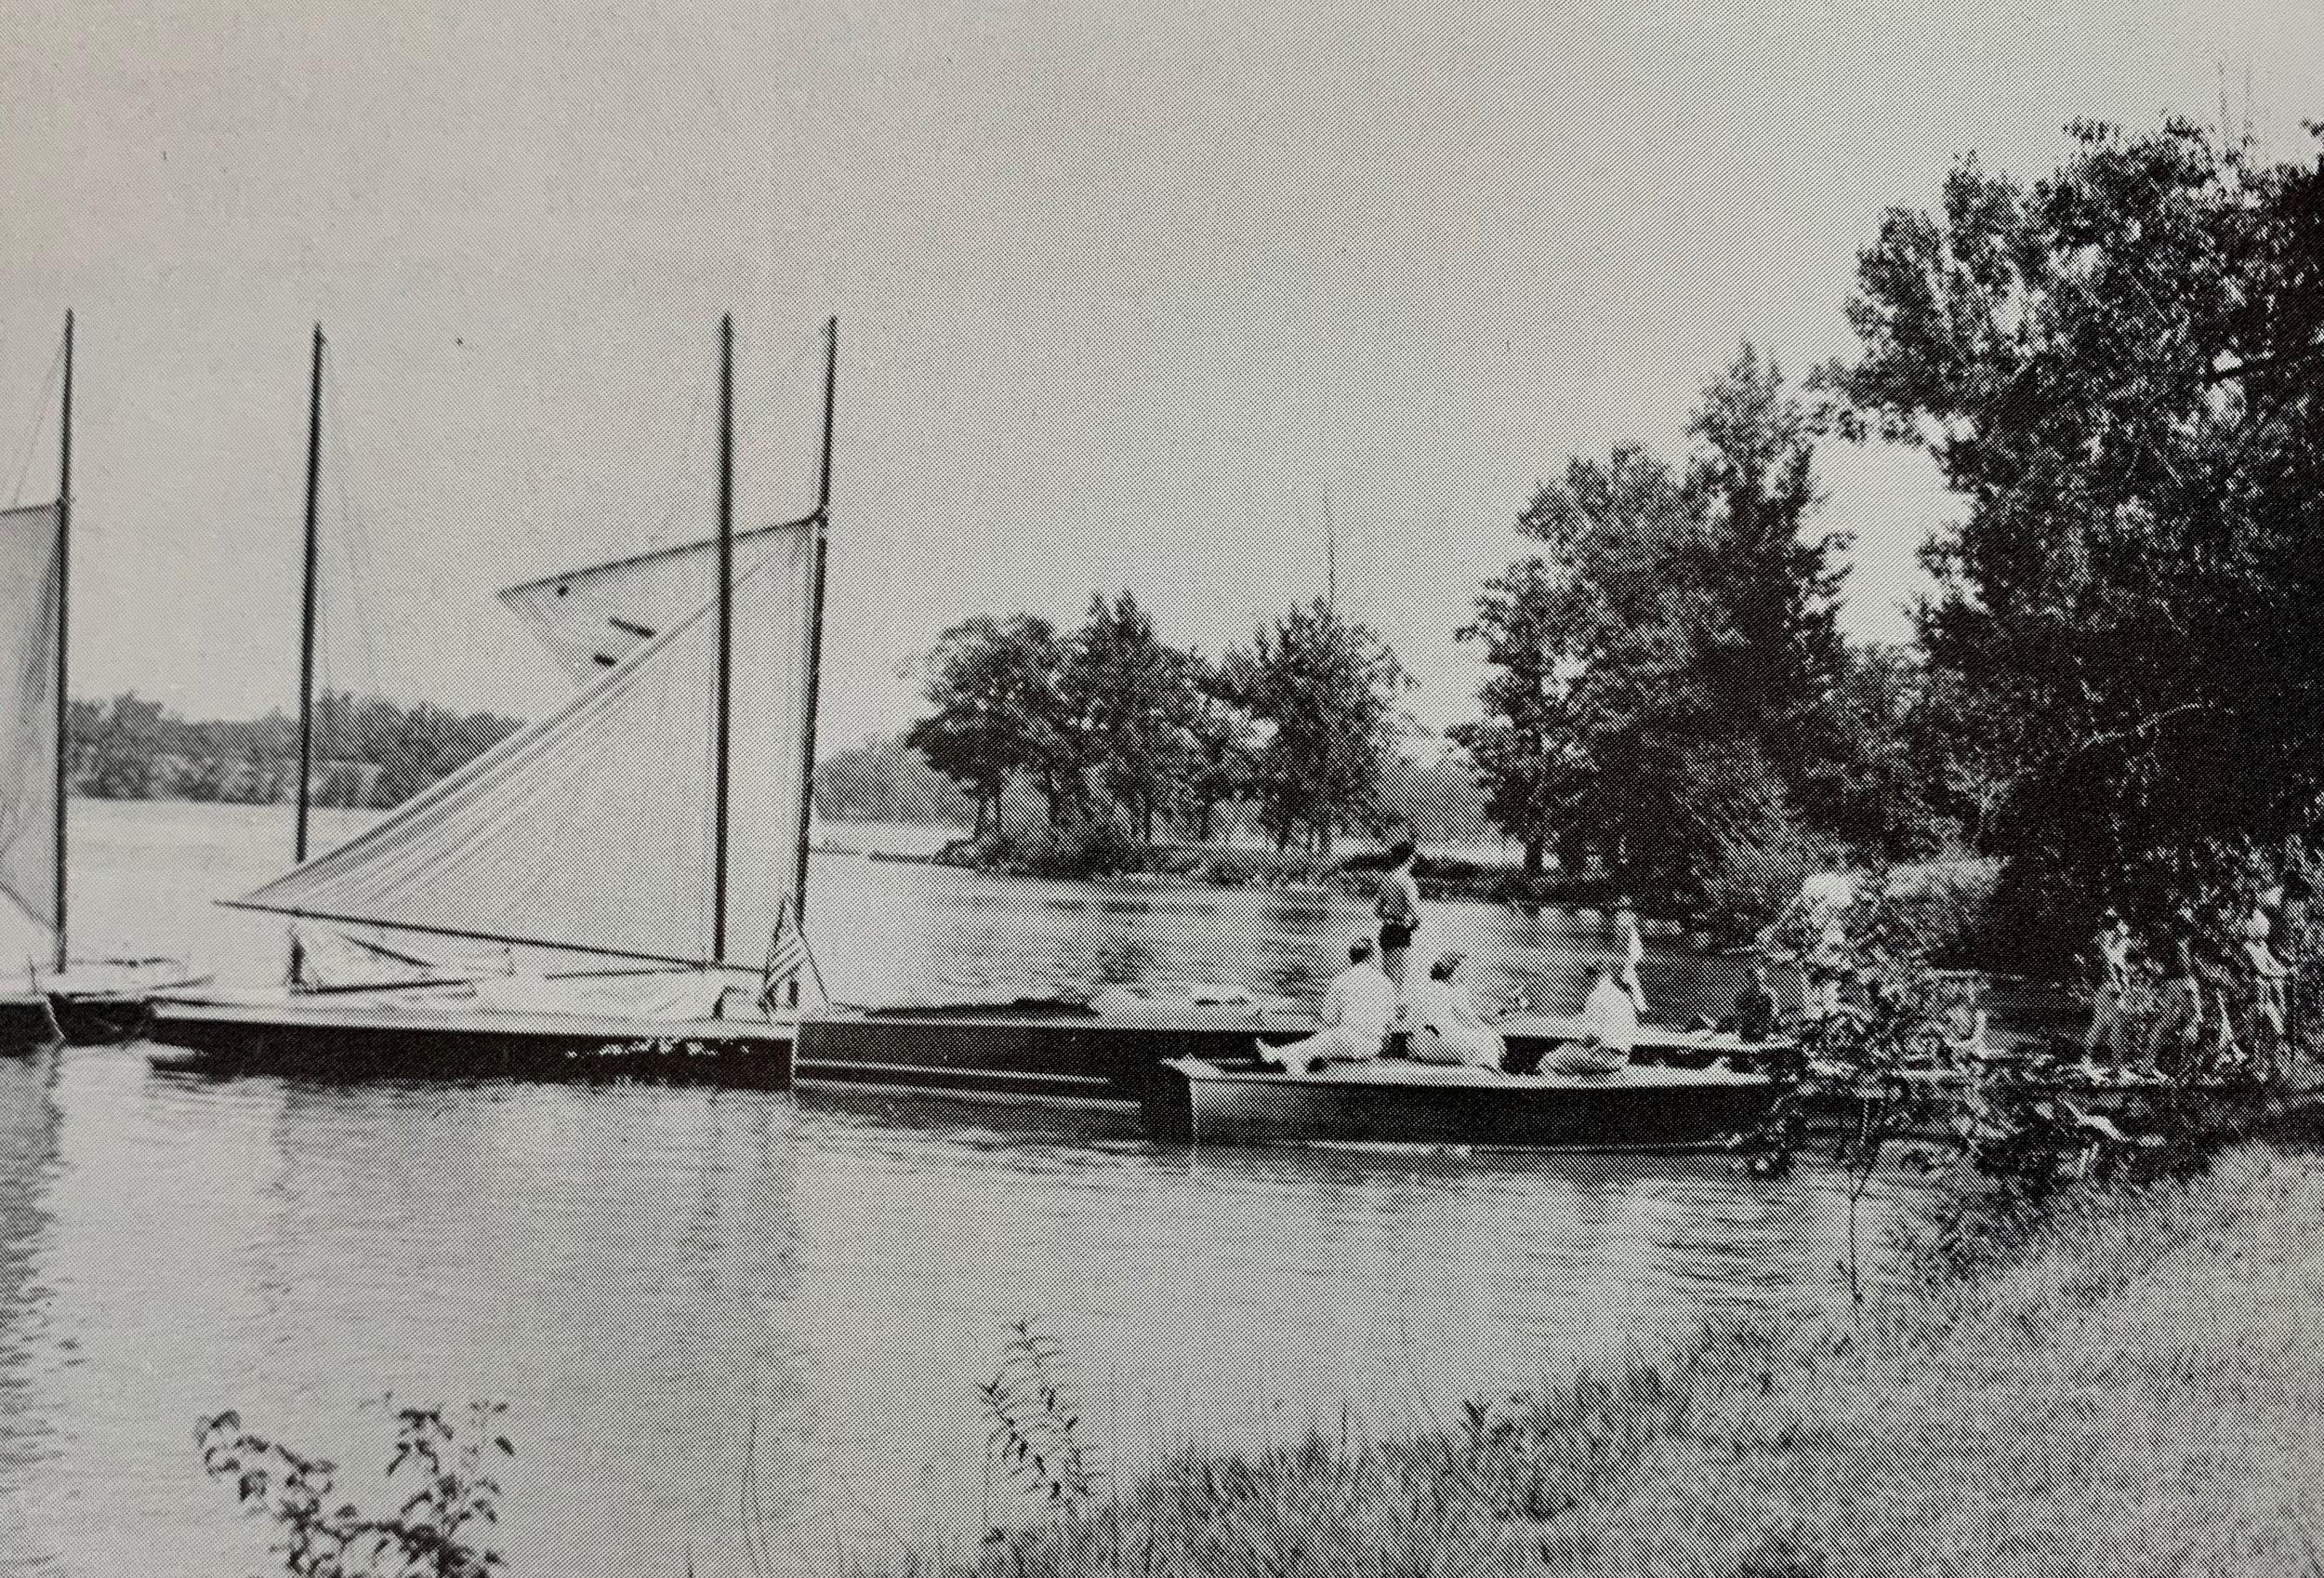 Lake_Beulah_History_LBYC-011.jpg